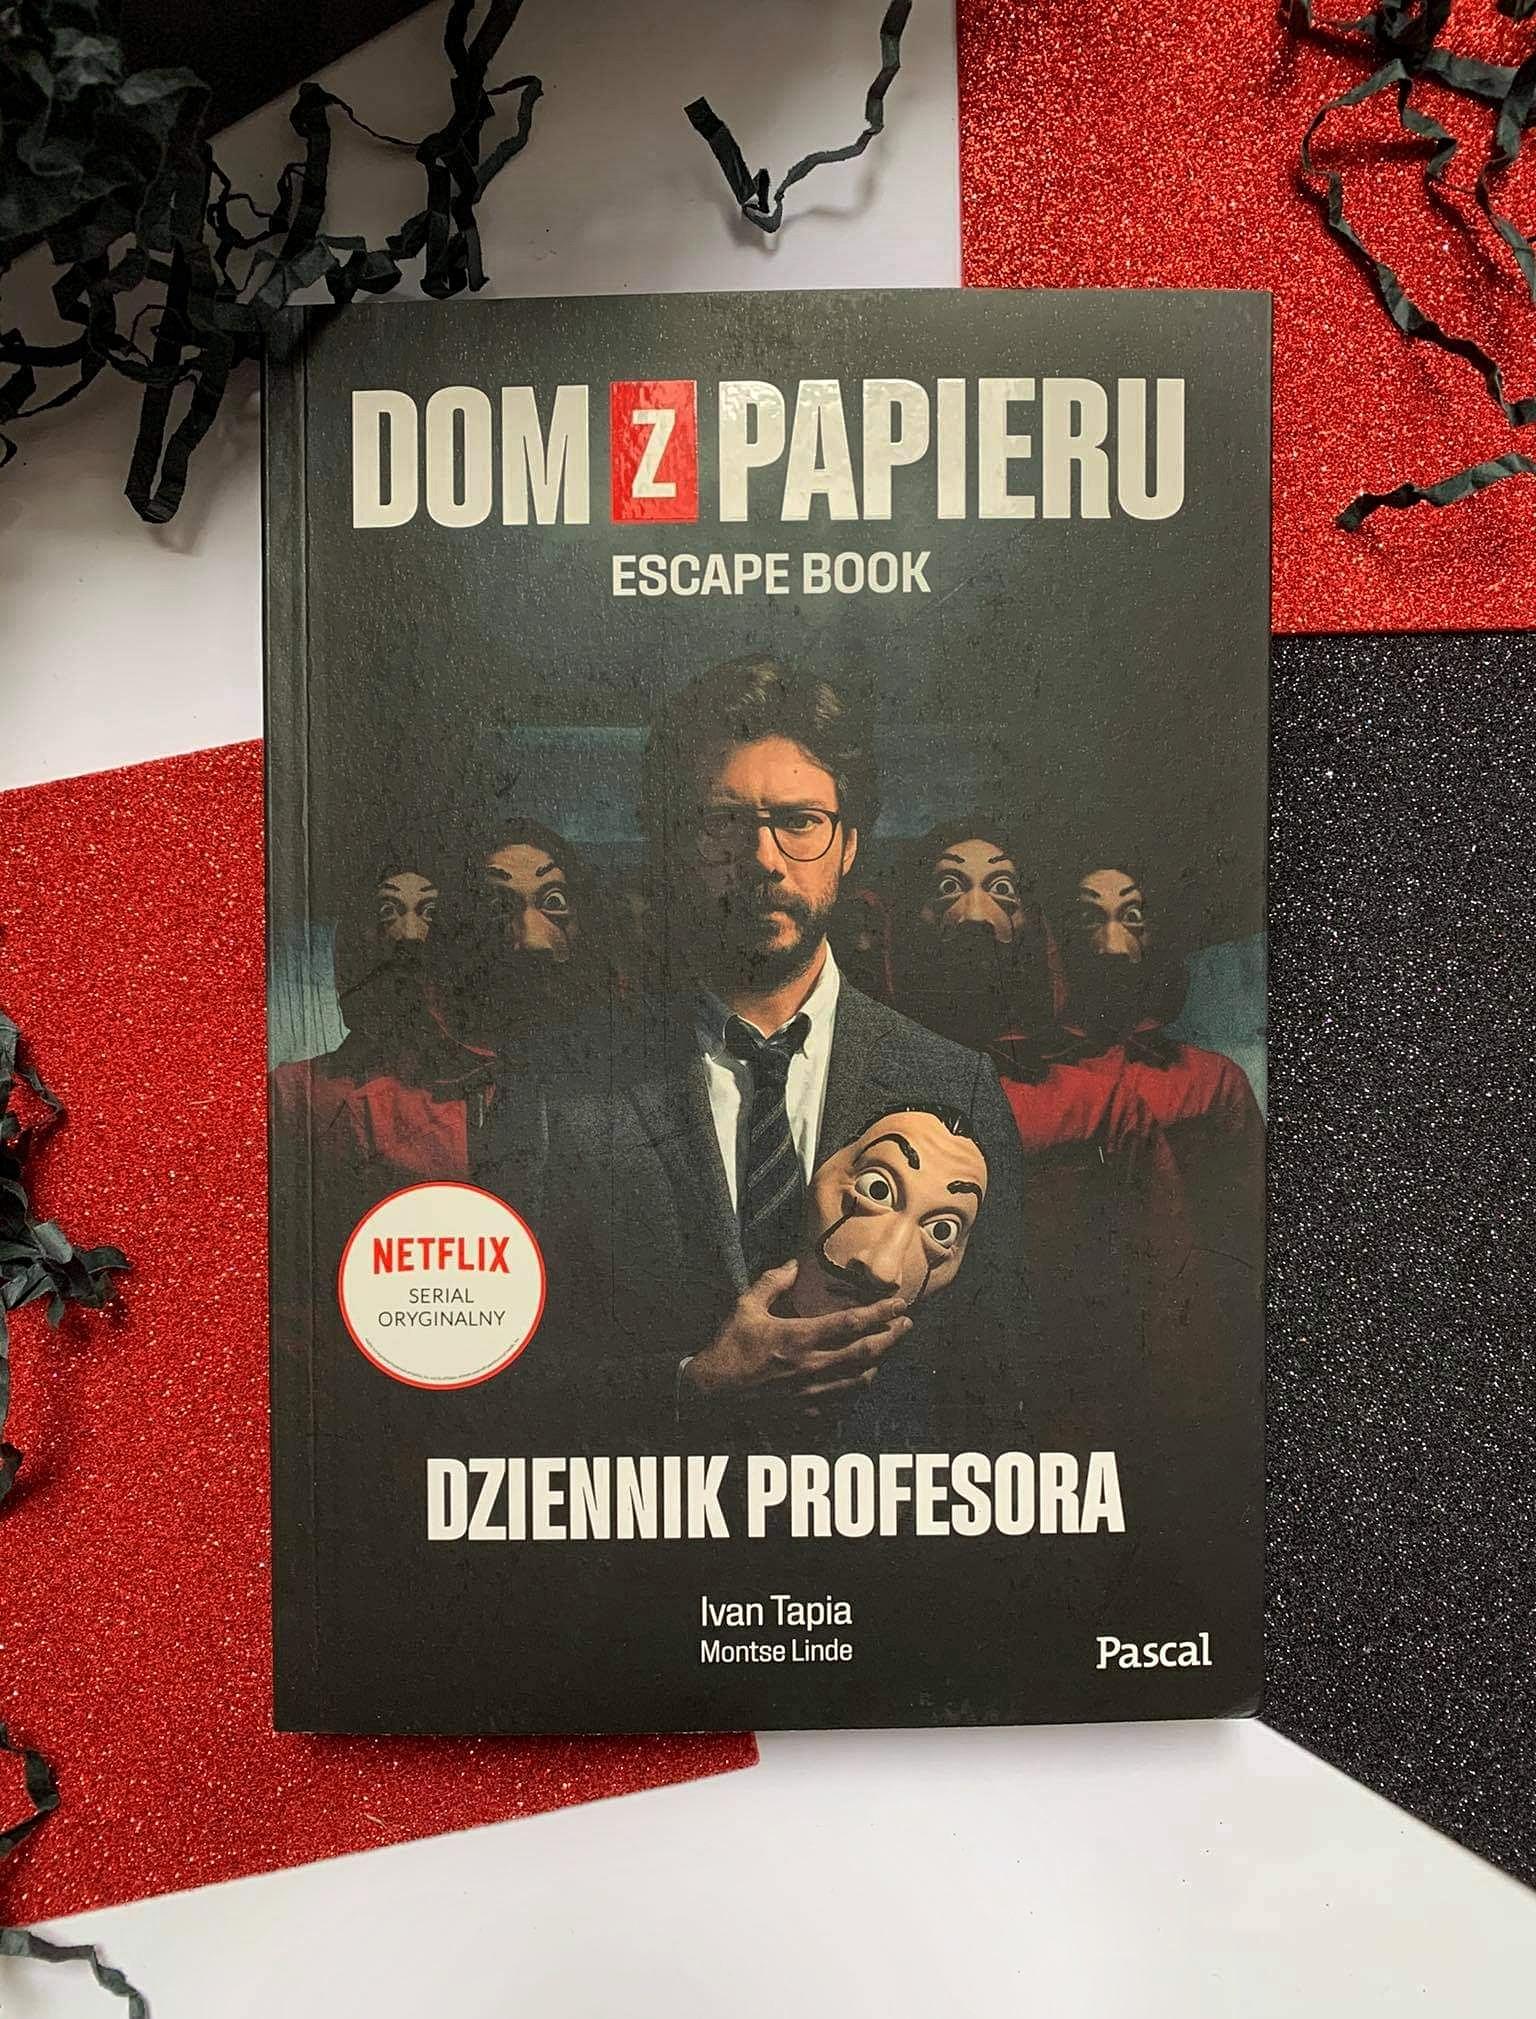 Dom z Papieru. Dziennik Profesora. Escape Book - Iwan Tapia  i Montse Linde